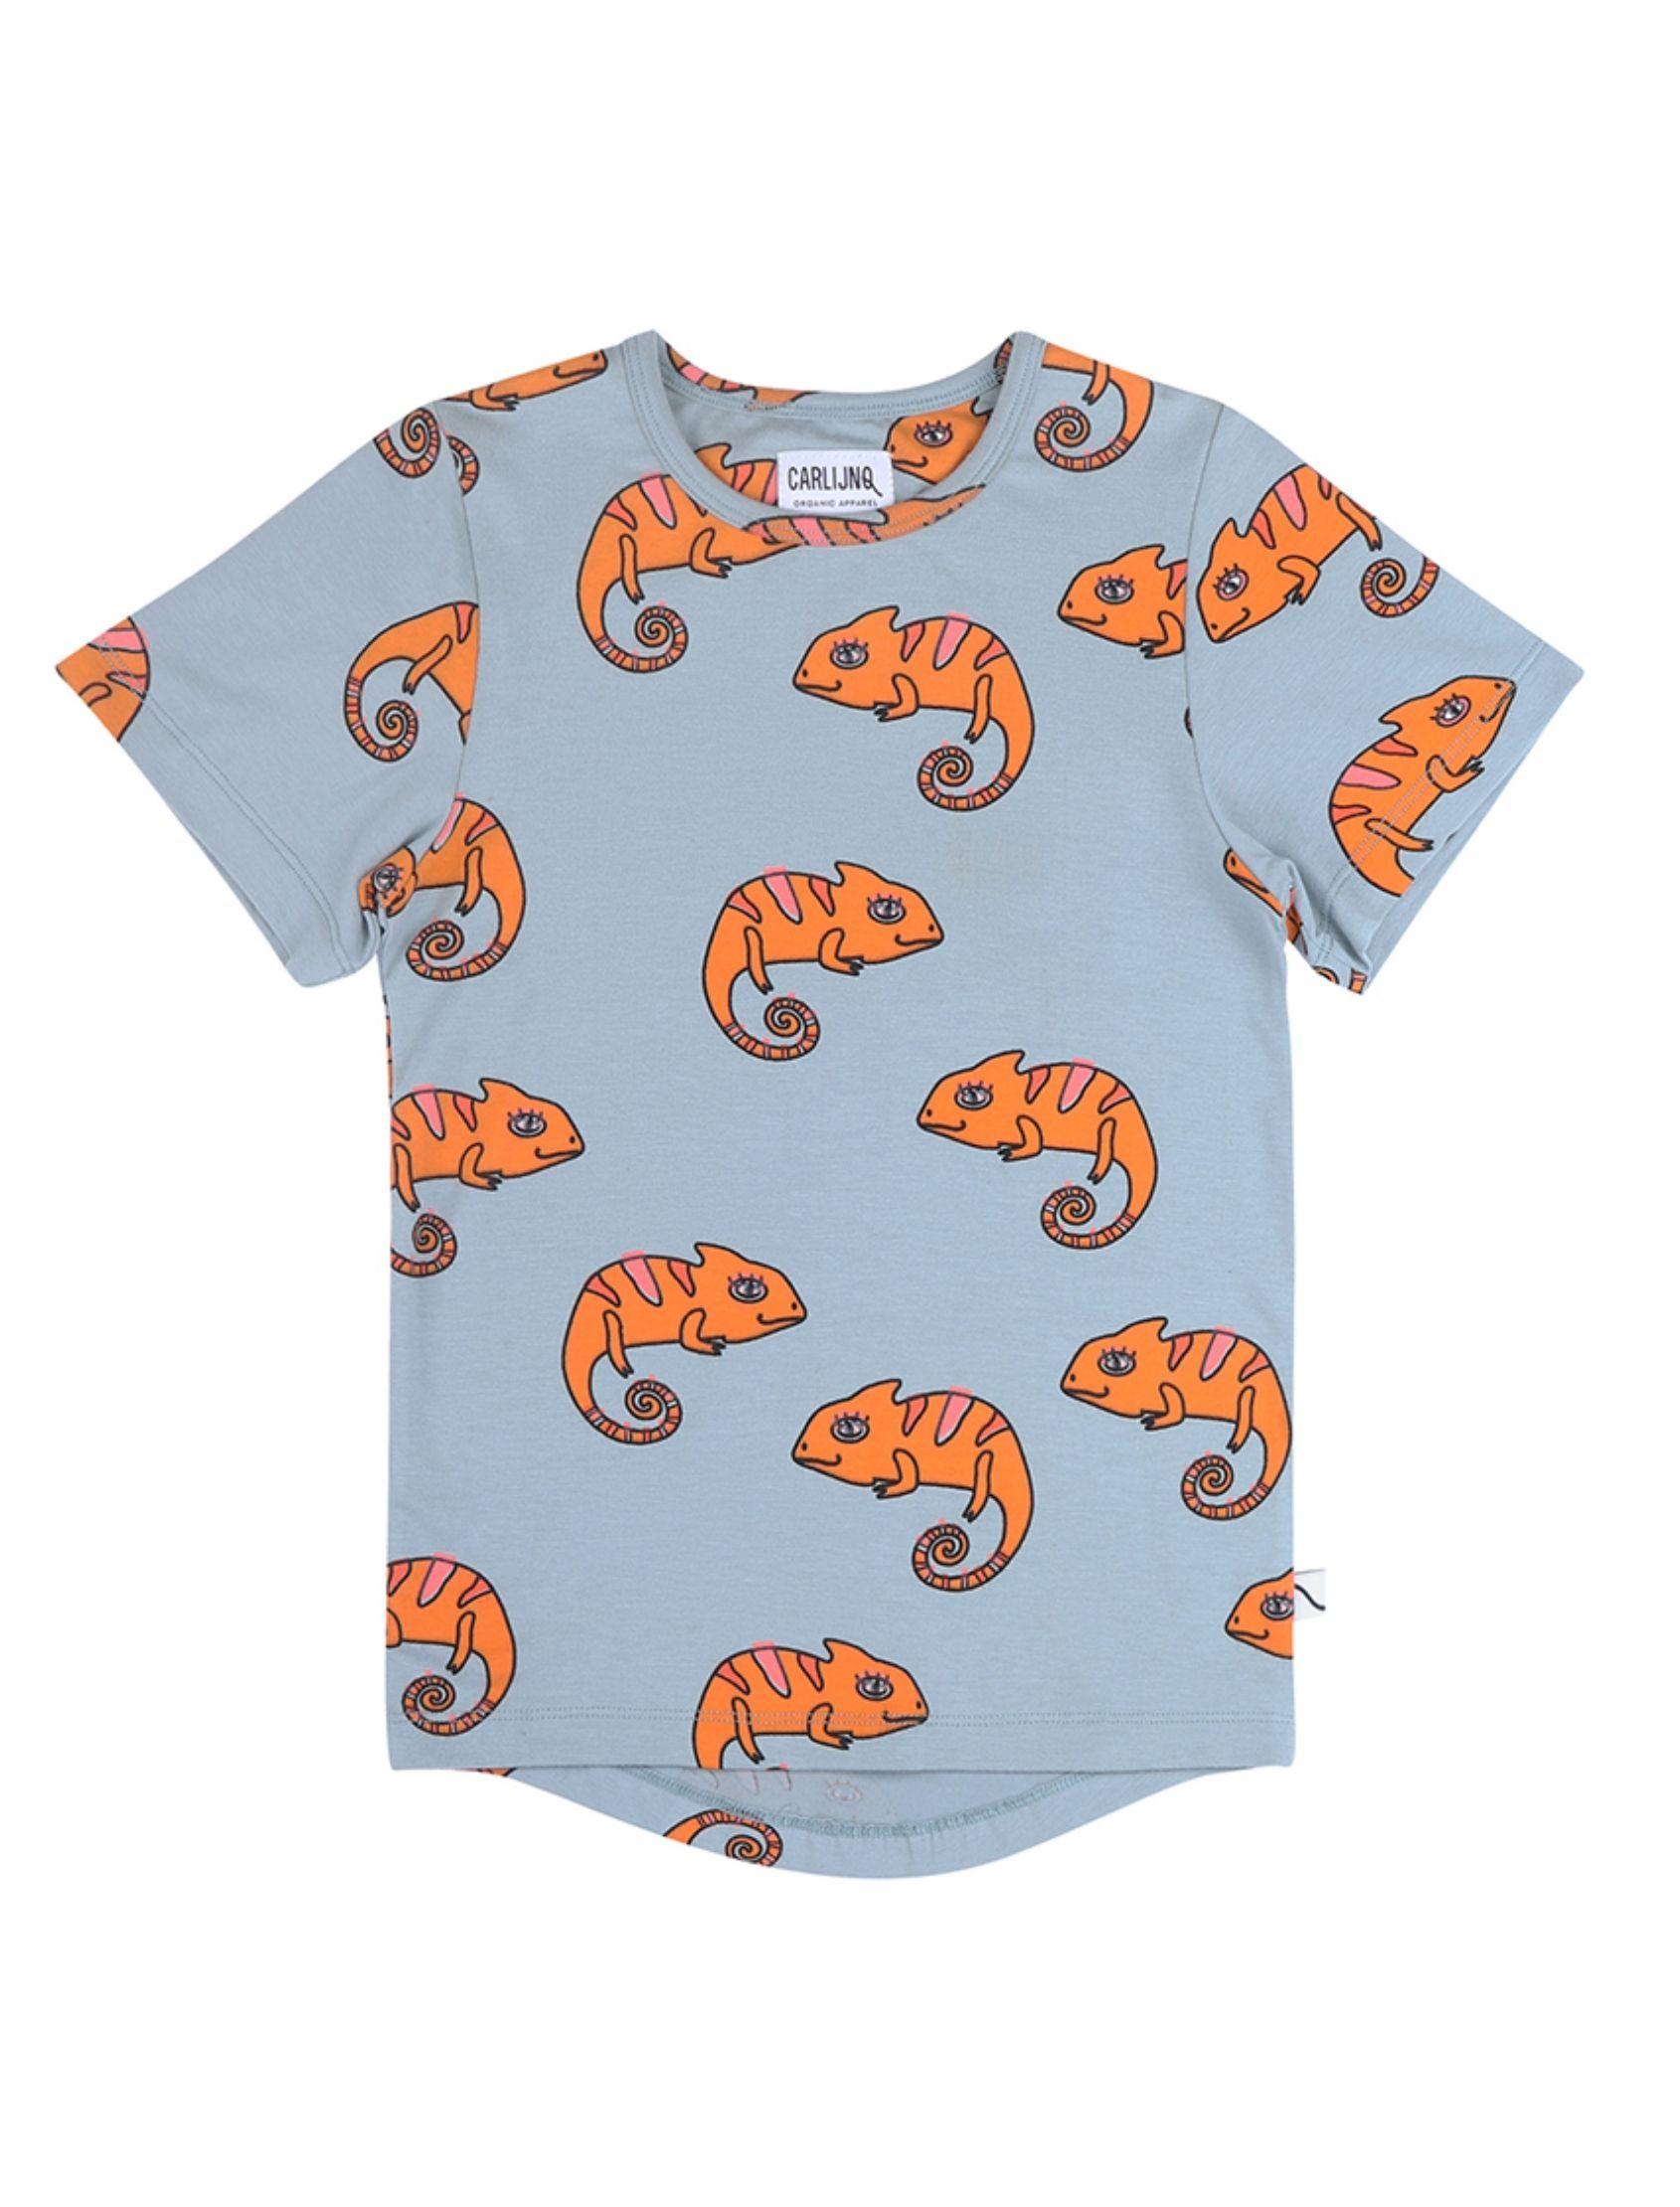 camiseta azul de manga corta con estampado de camaleones en naranja